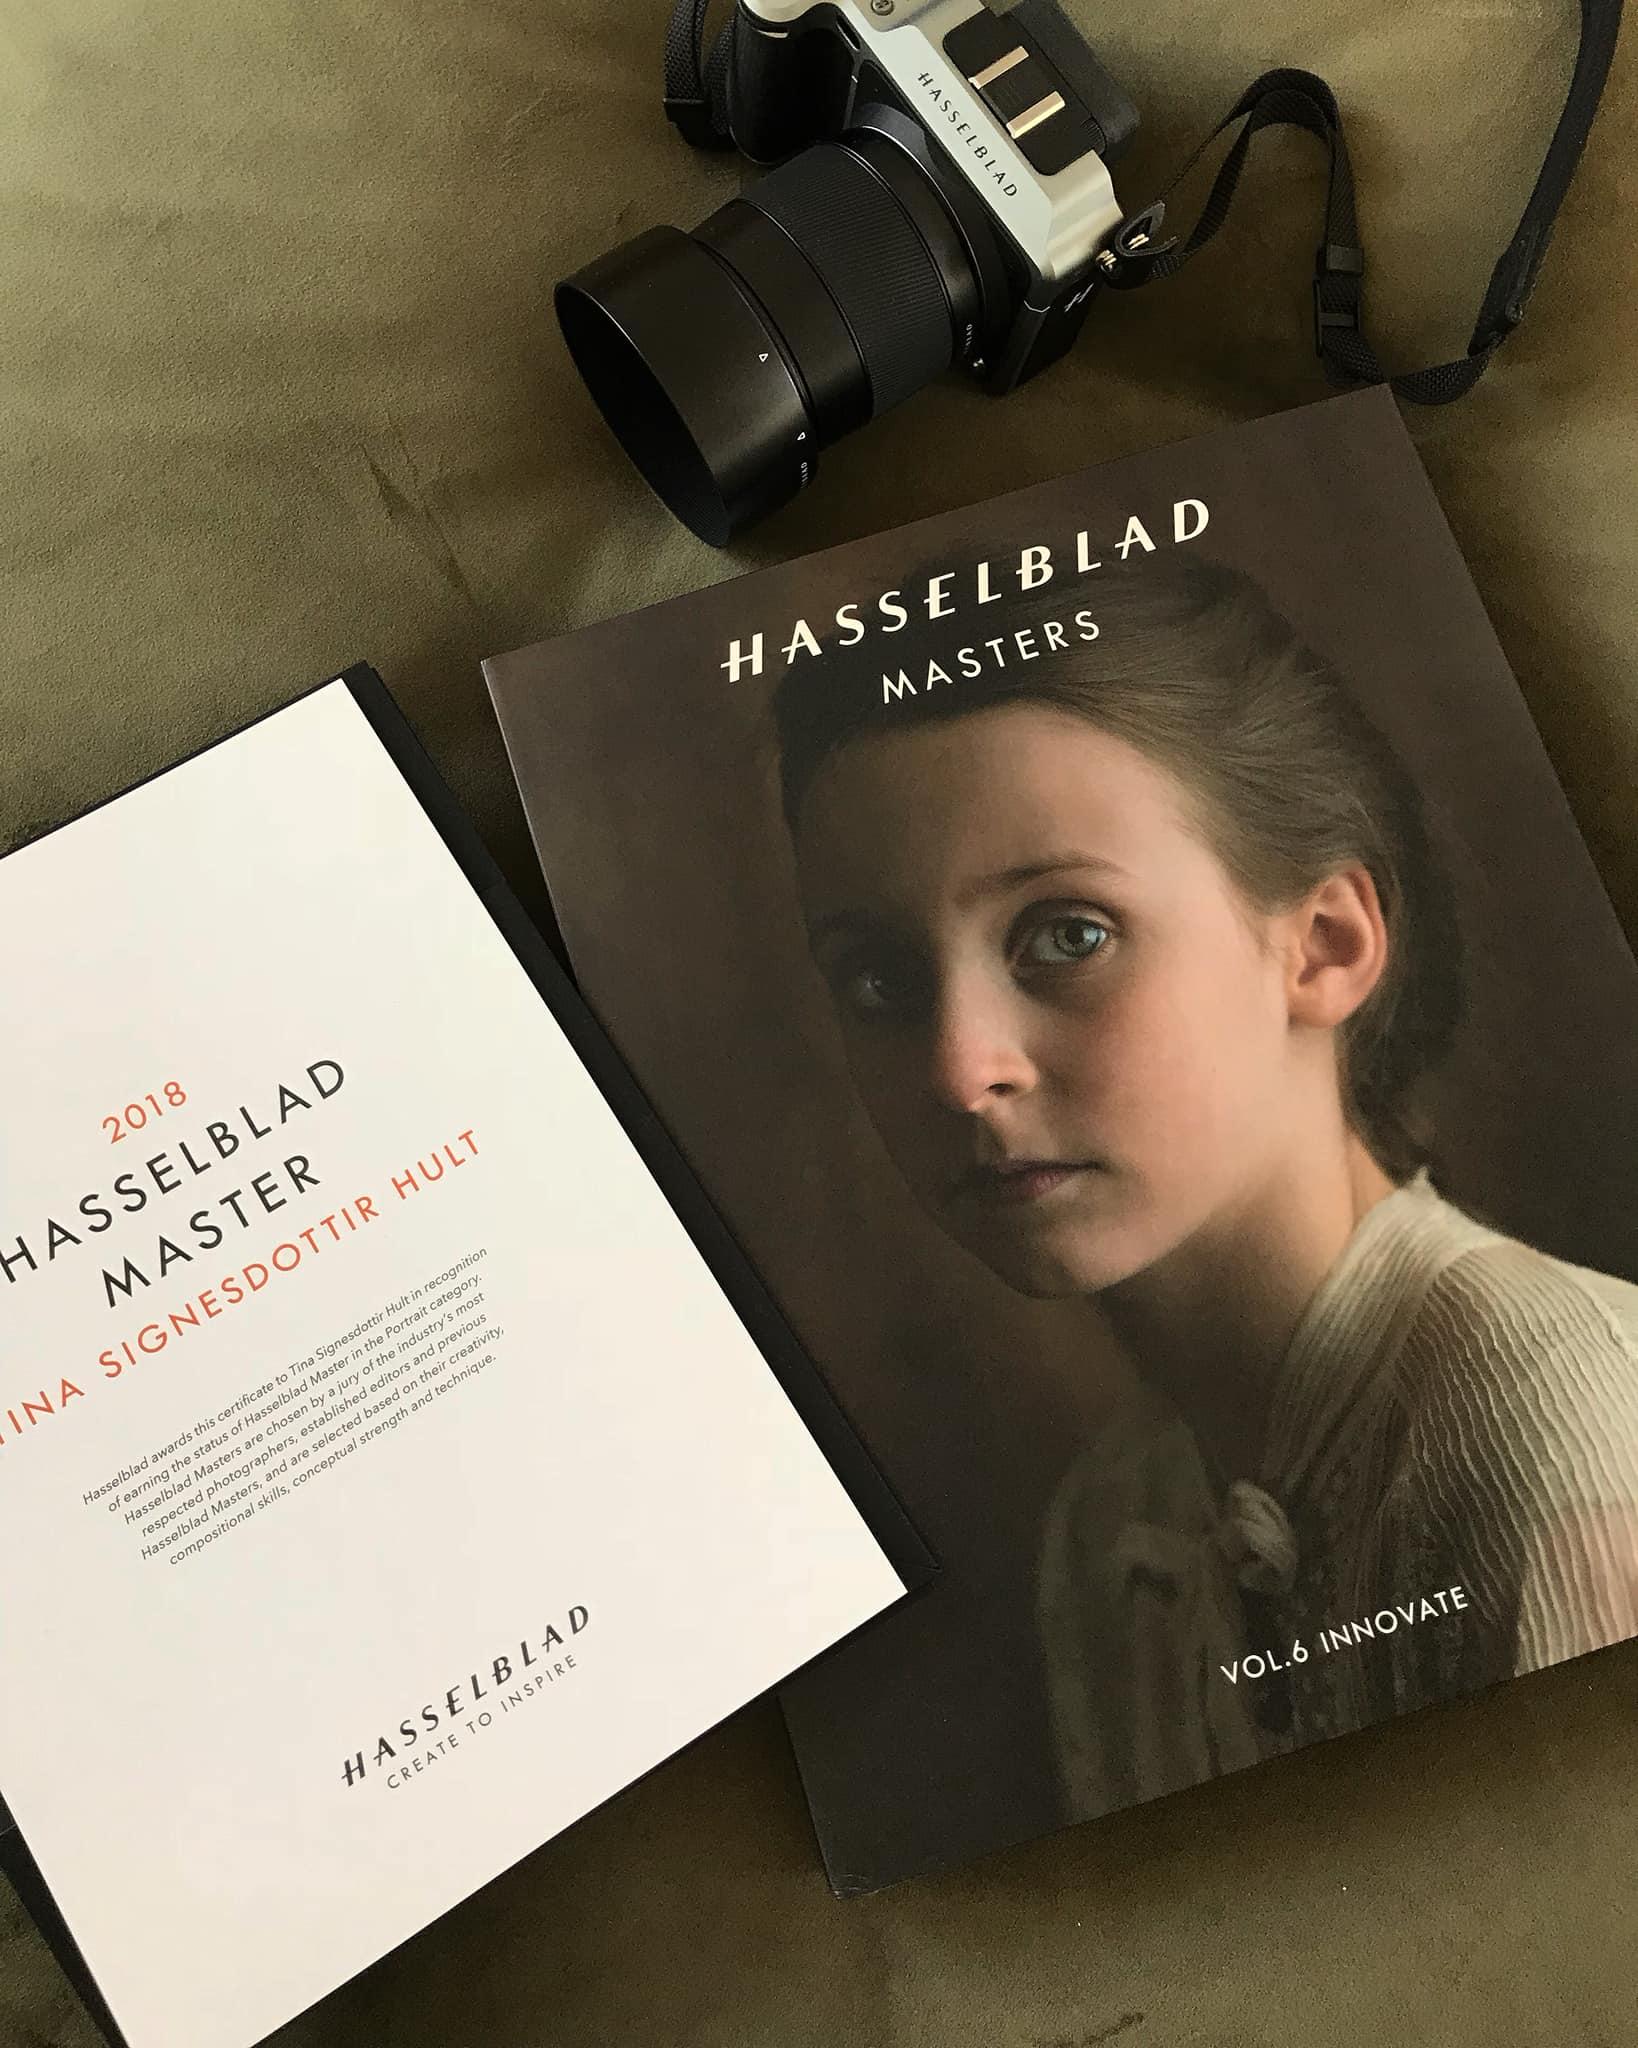 Tina Signesdottir Hults bilde pryder omslaget til Hasselblad Master-boken